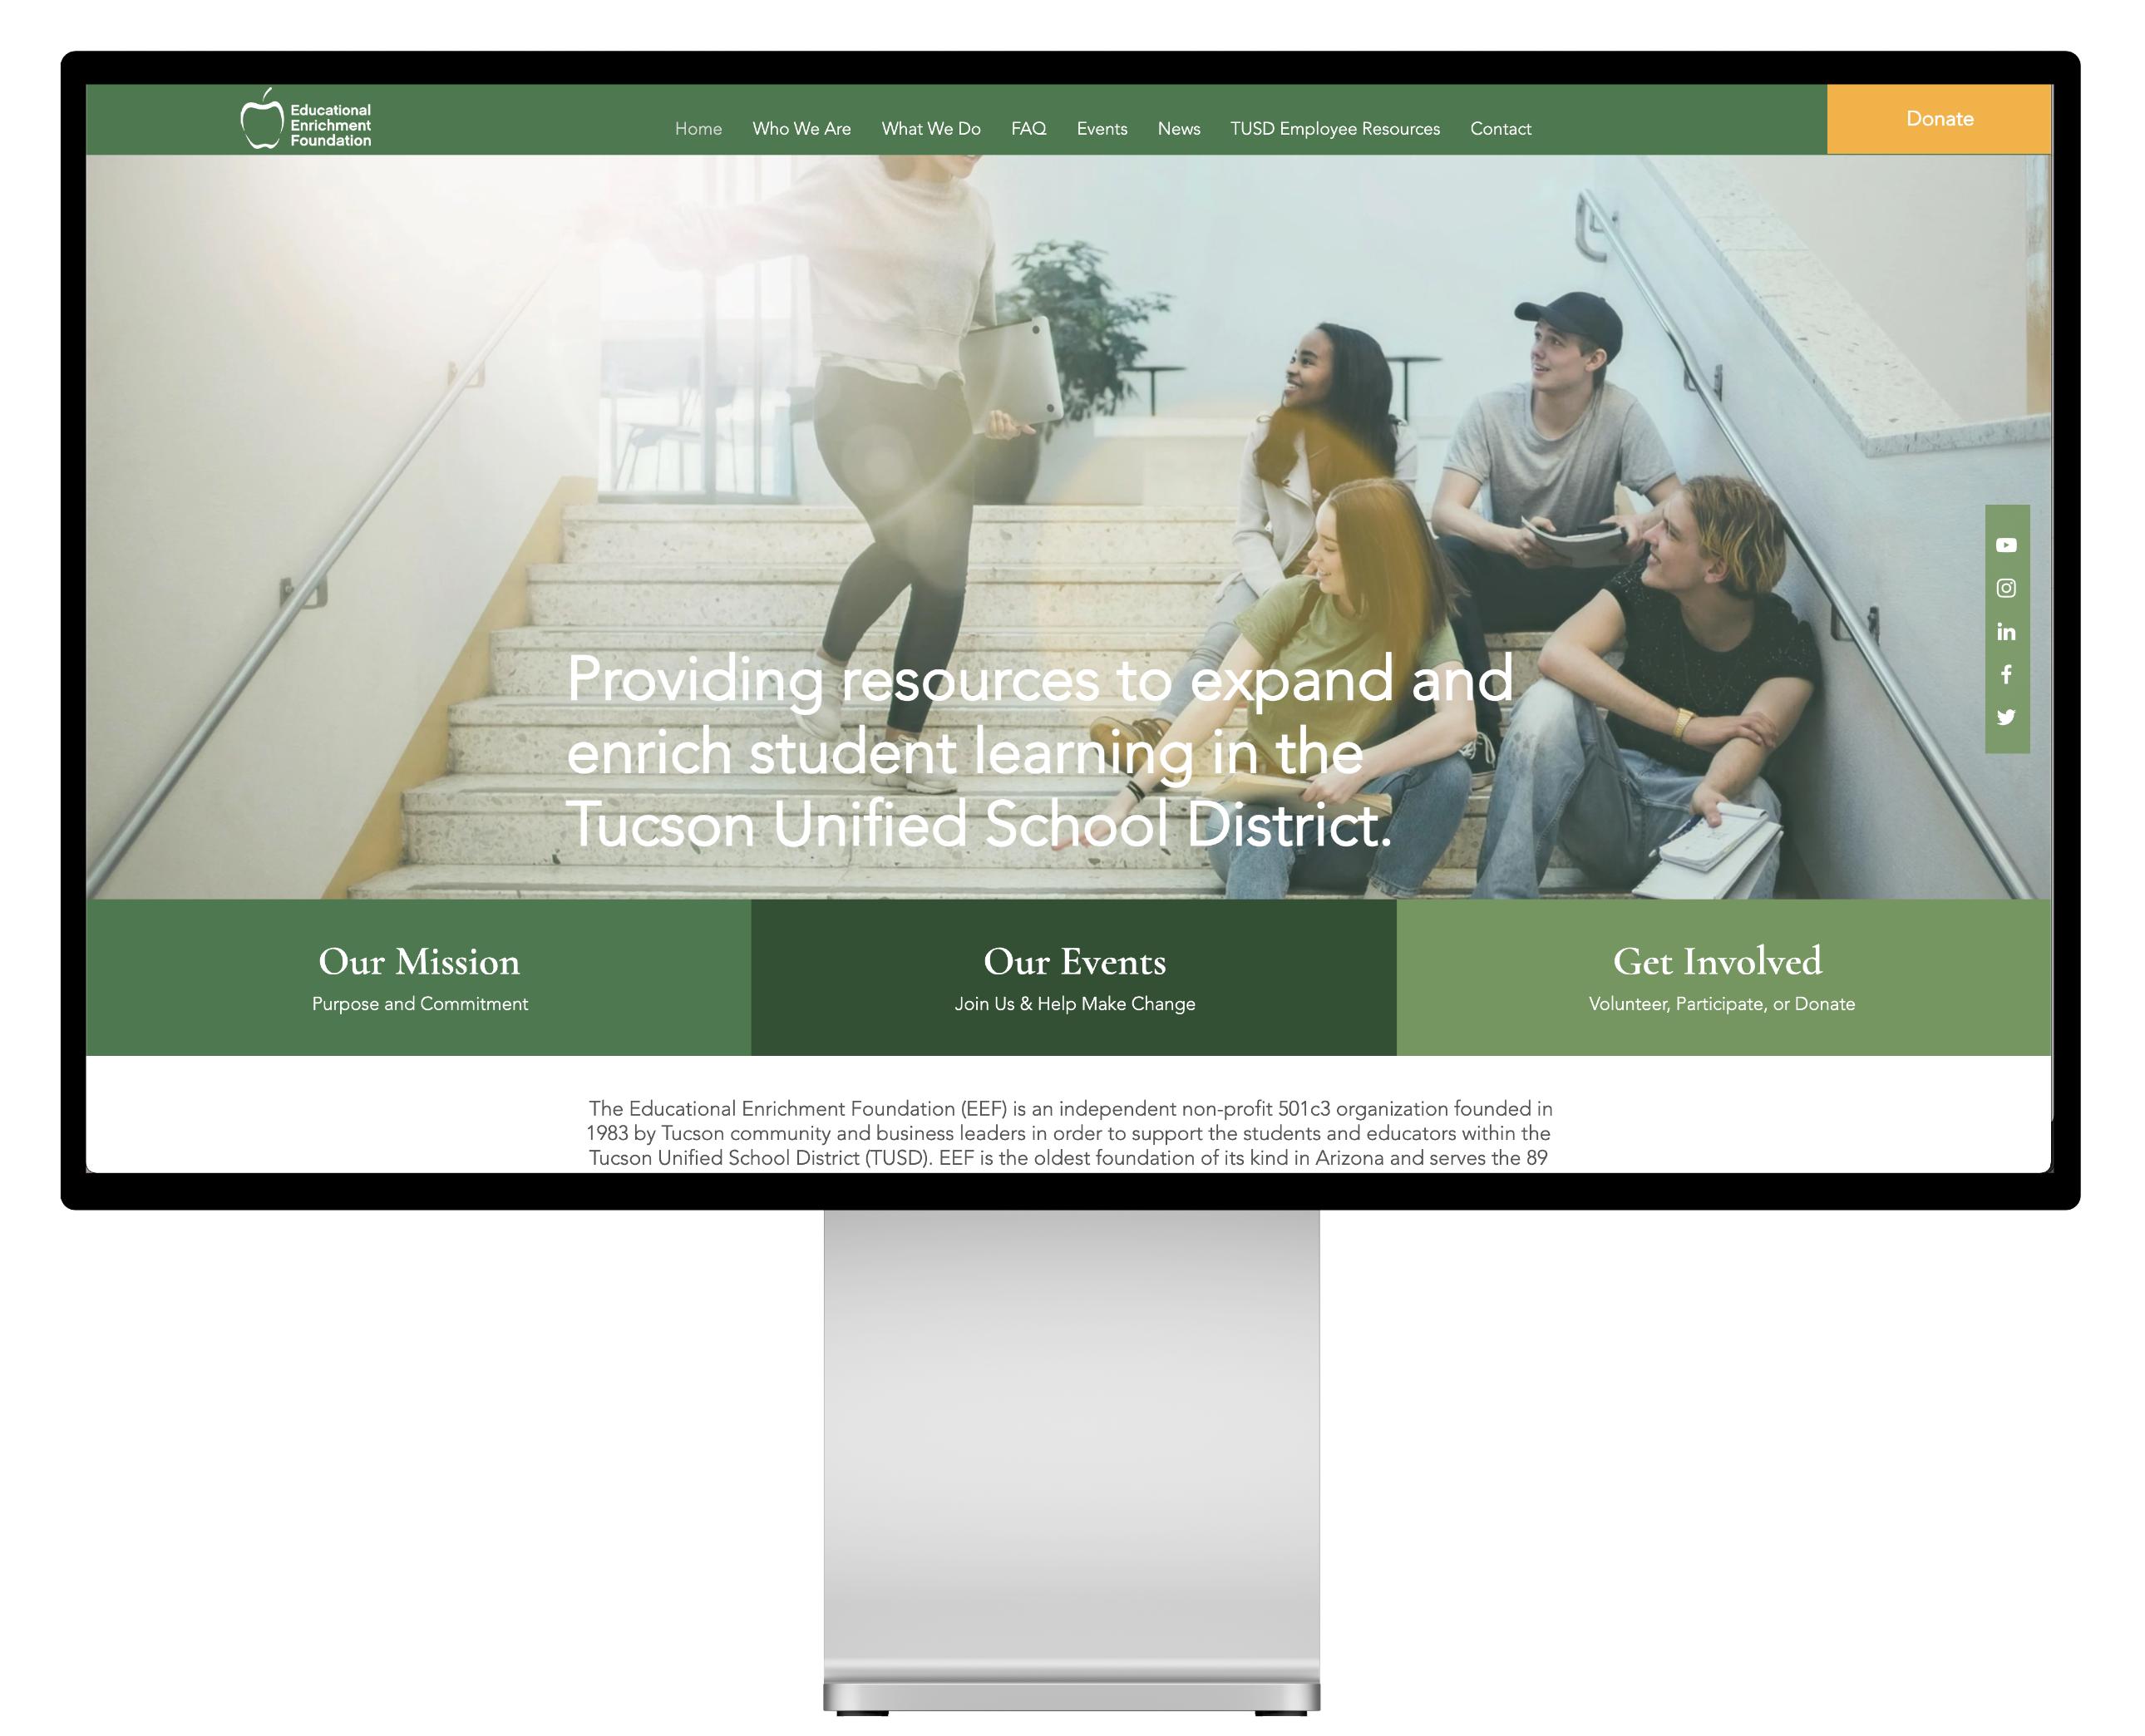 responsive web redesign